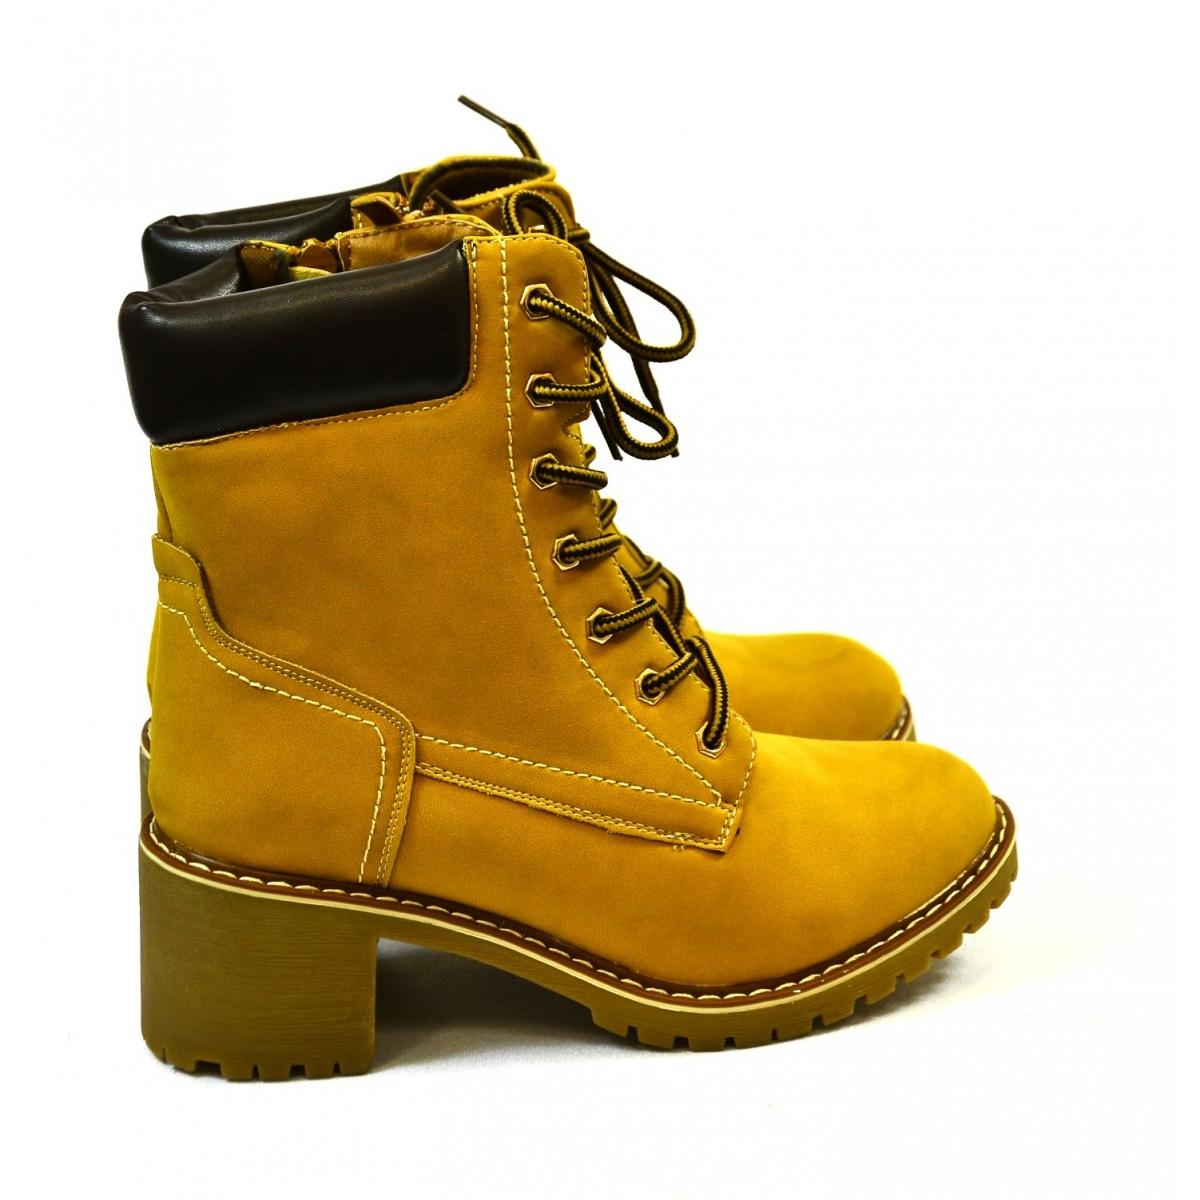 0830642f1157 Dámske žlto-hnedé členkové čižmy JESA - 2